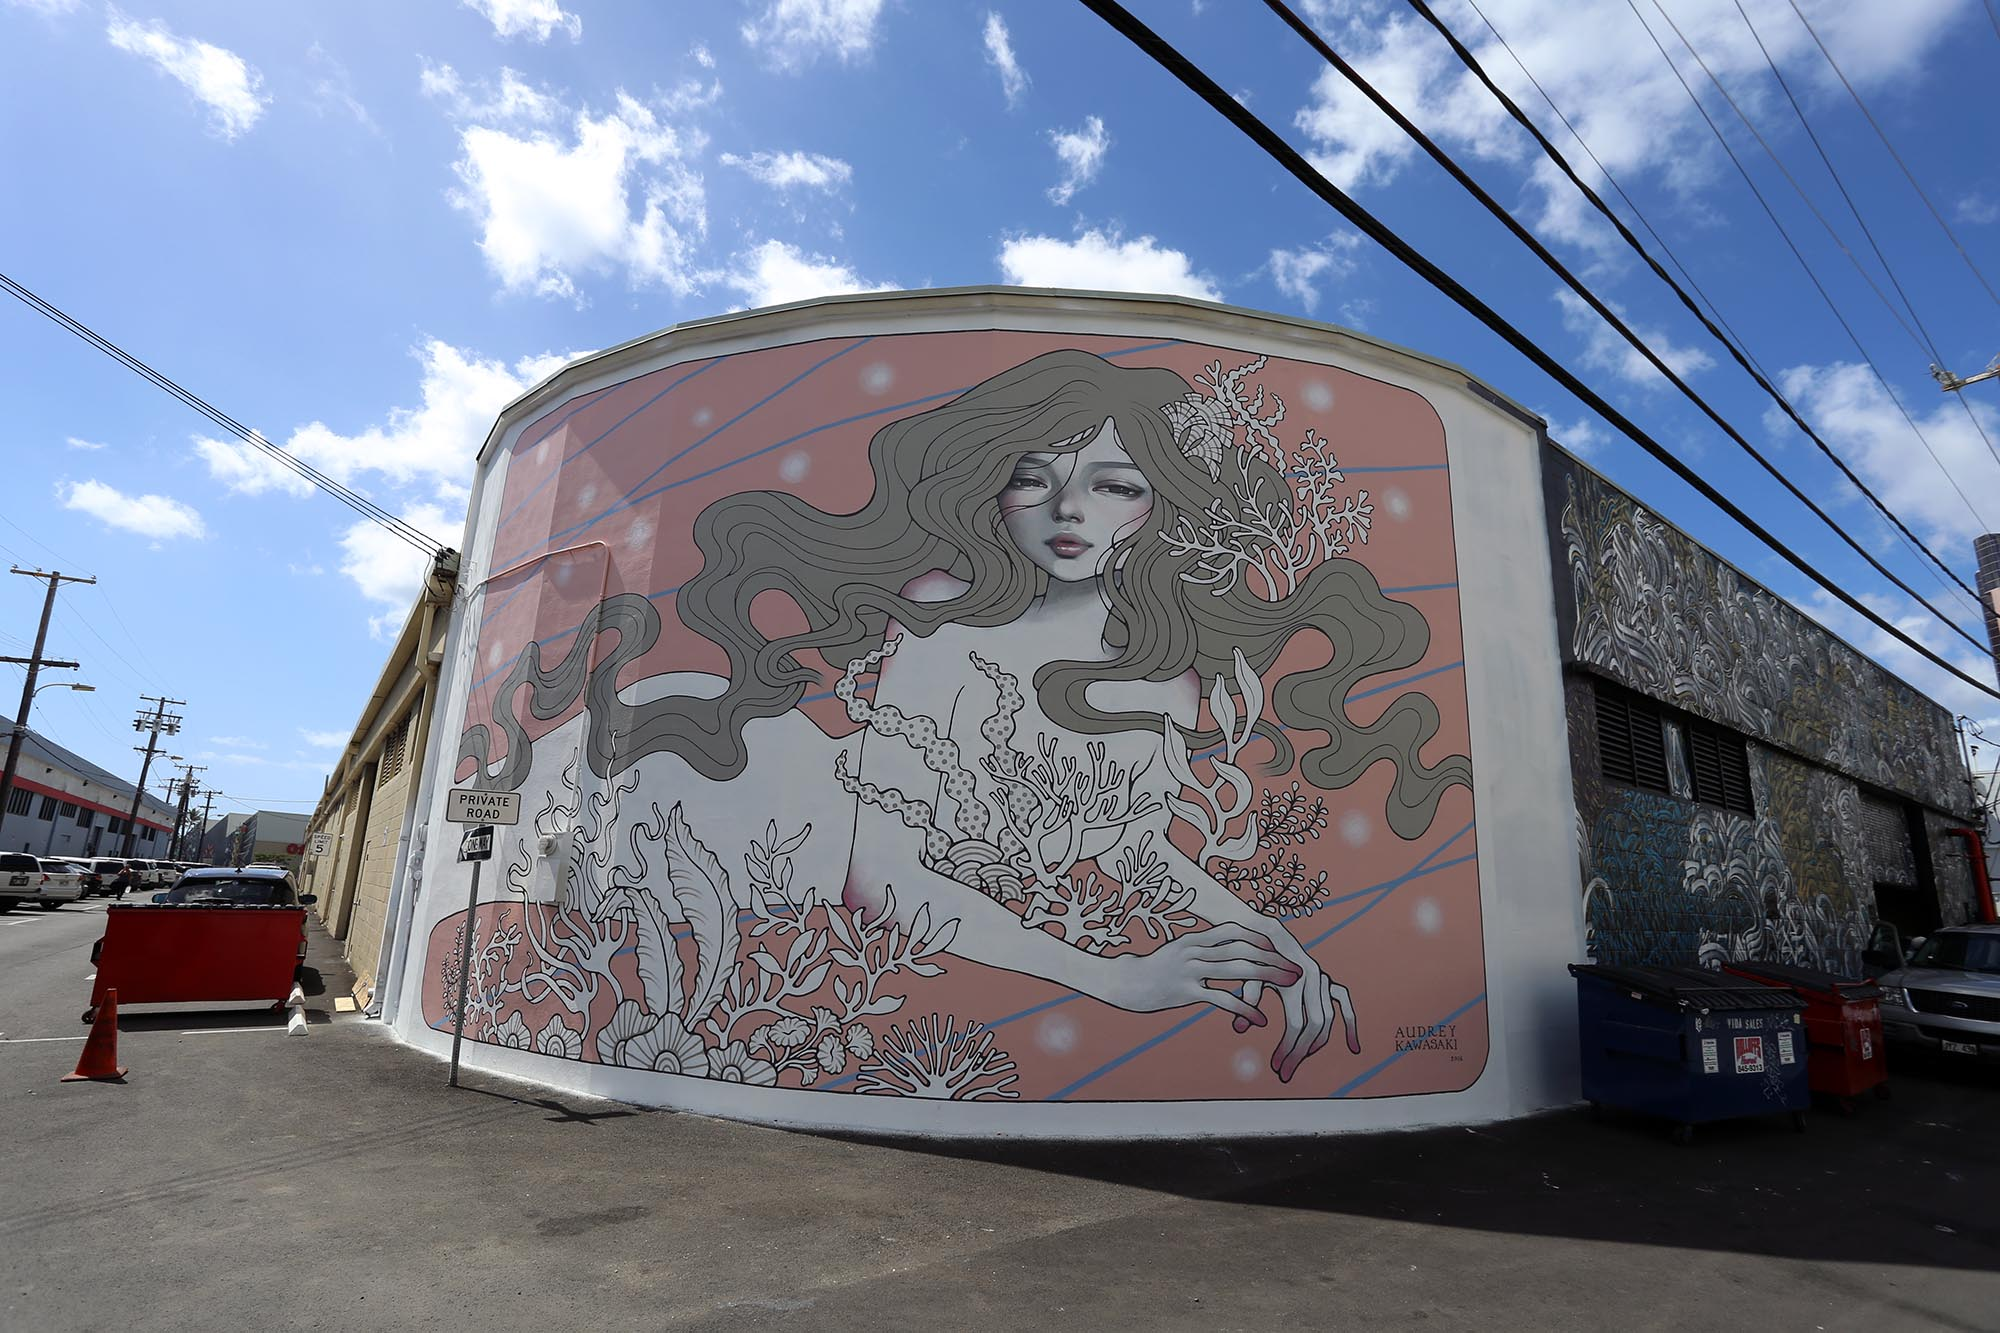 audrey_kawasaki_powwow-festival-grafite-mural-dionisio-arte (1)